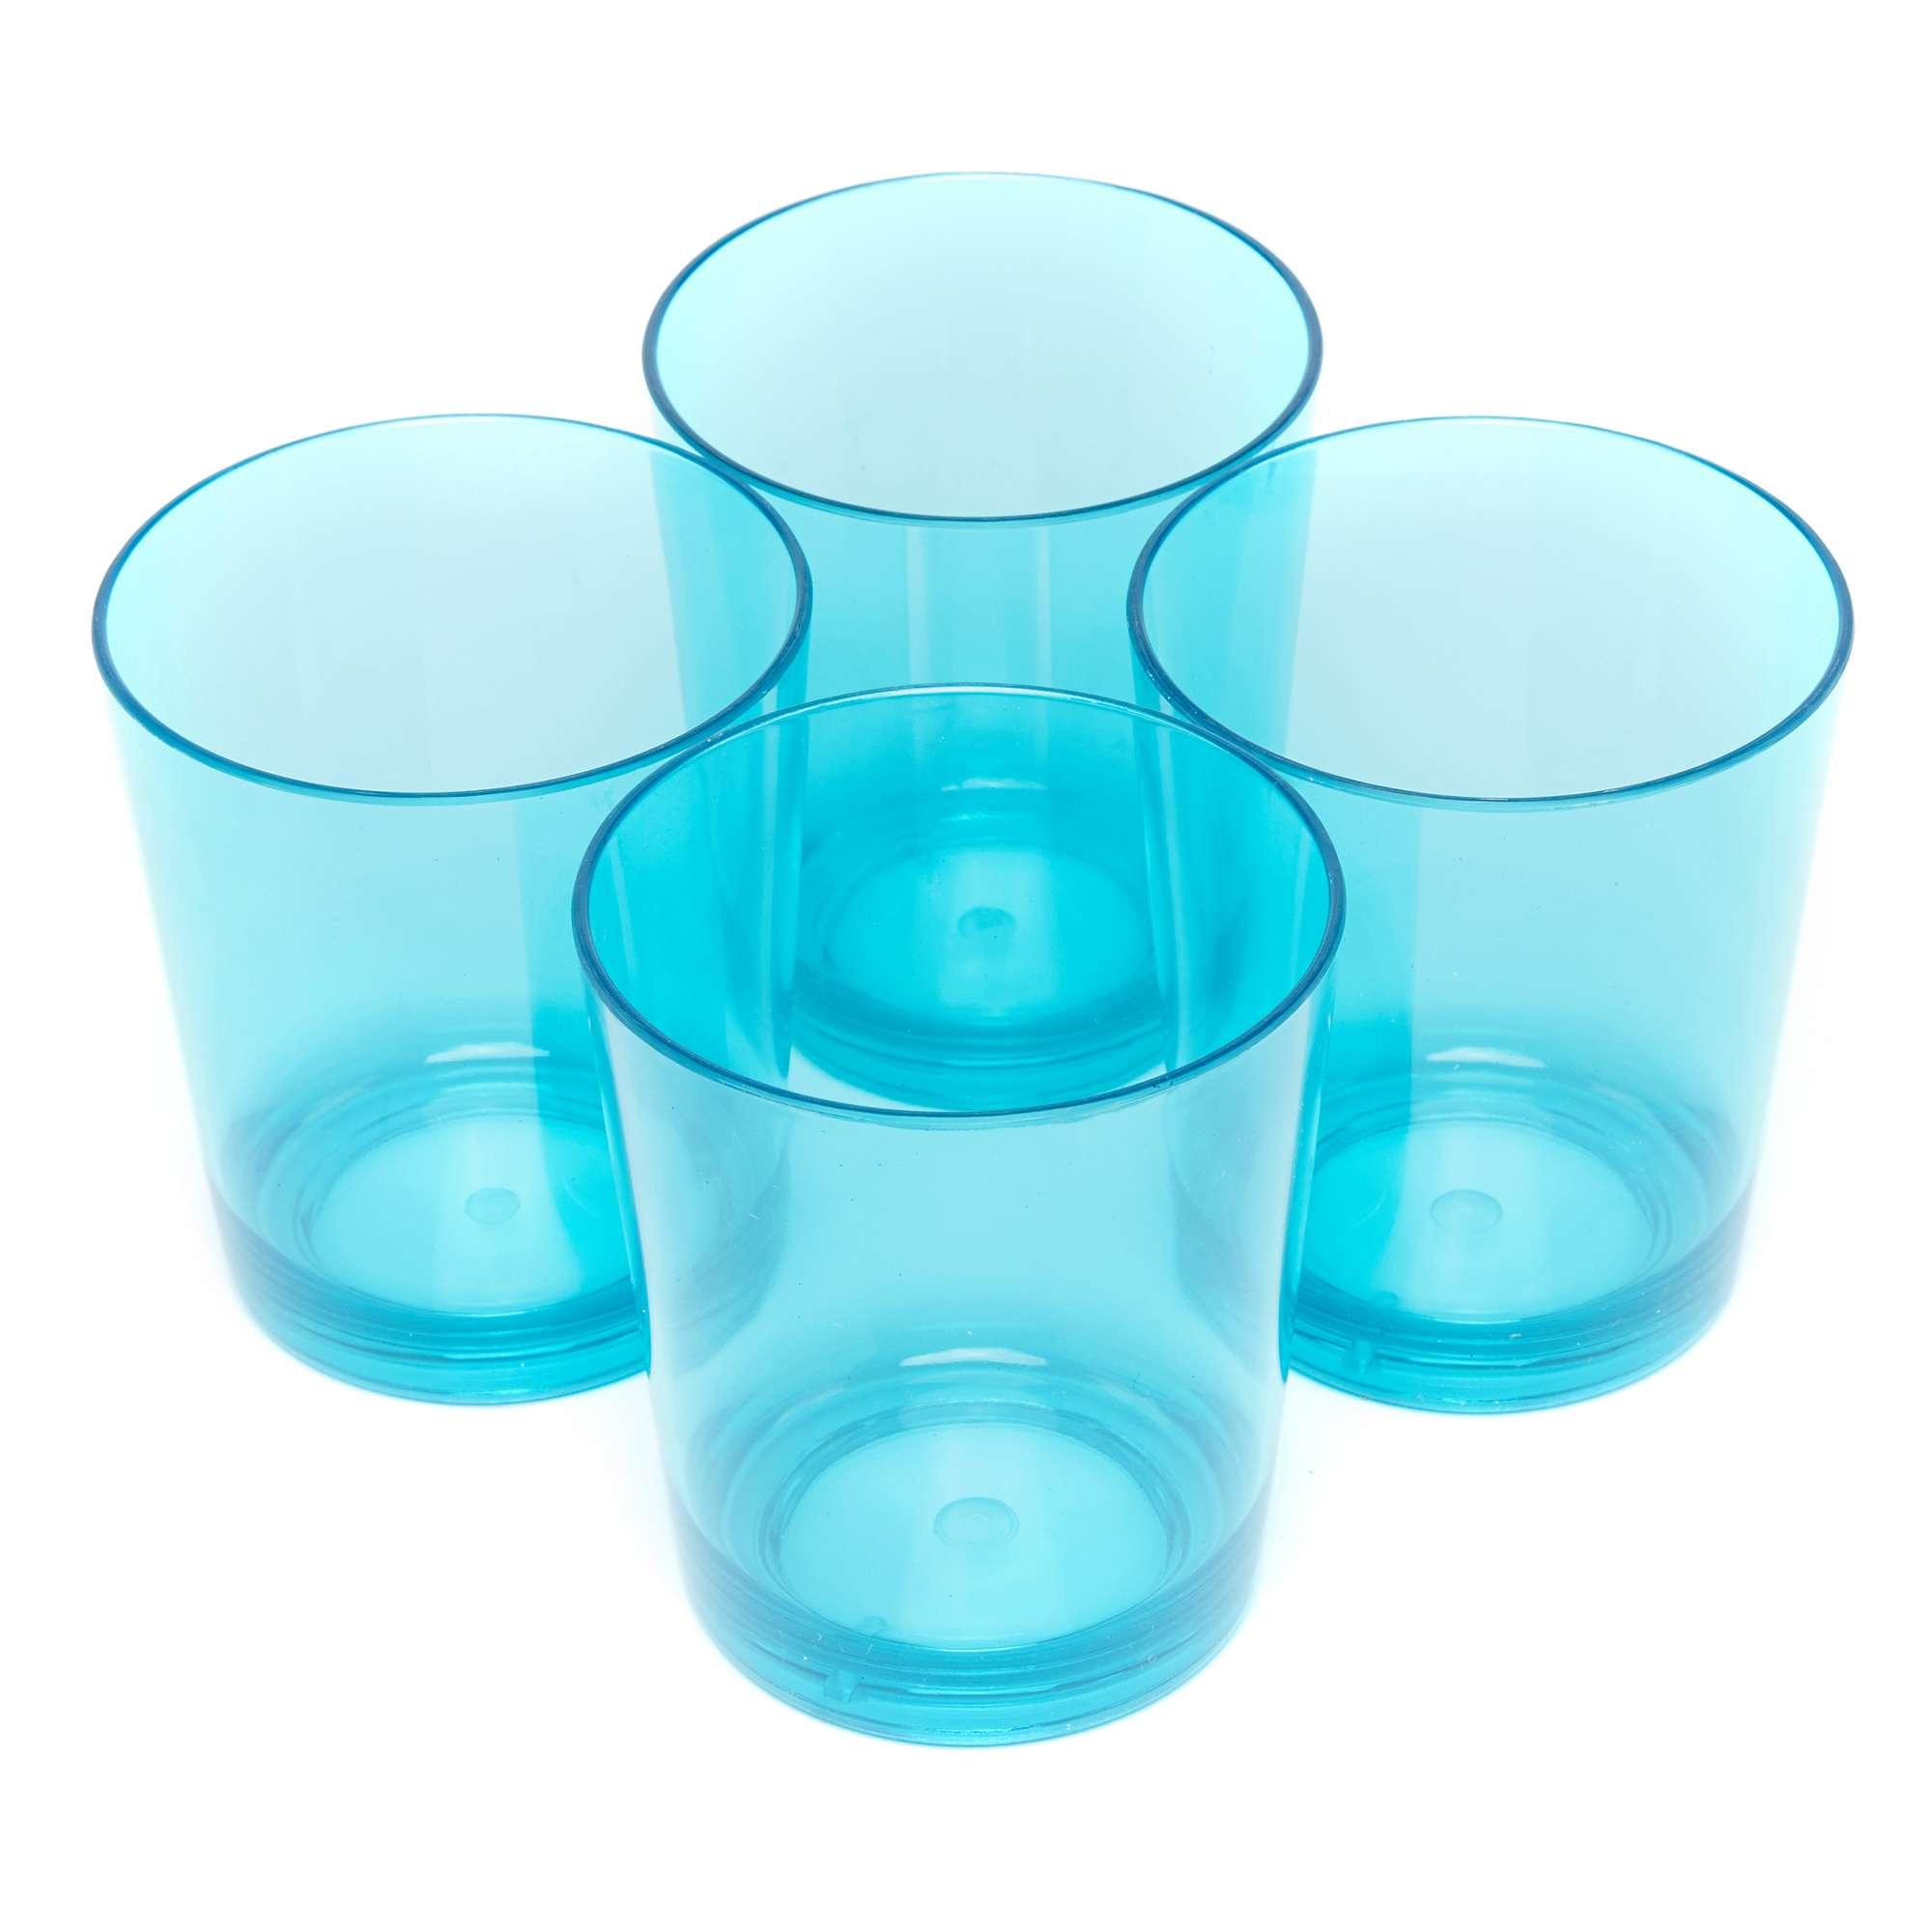 EUROHIKE Tumbler Glasses (4 Pack)